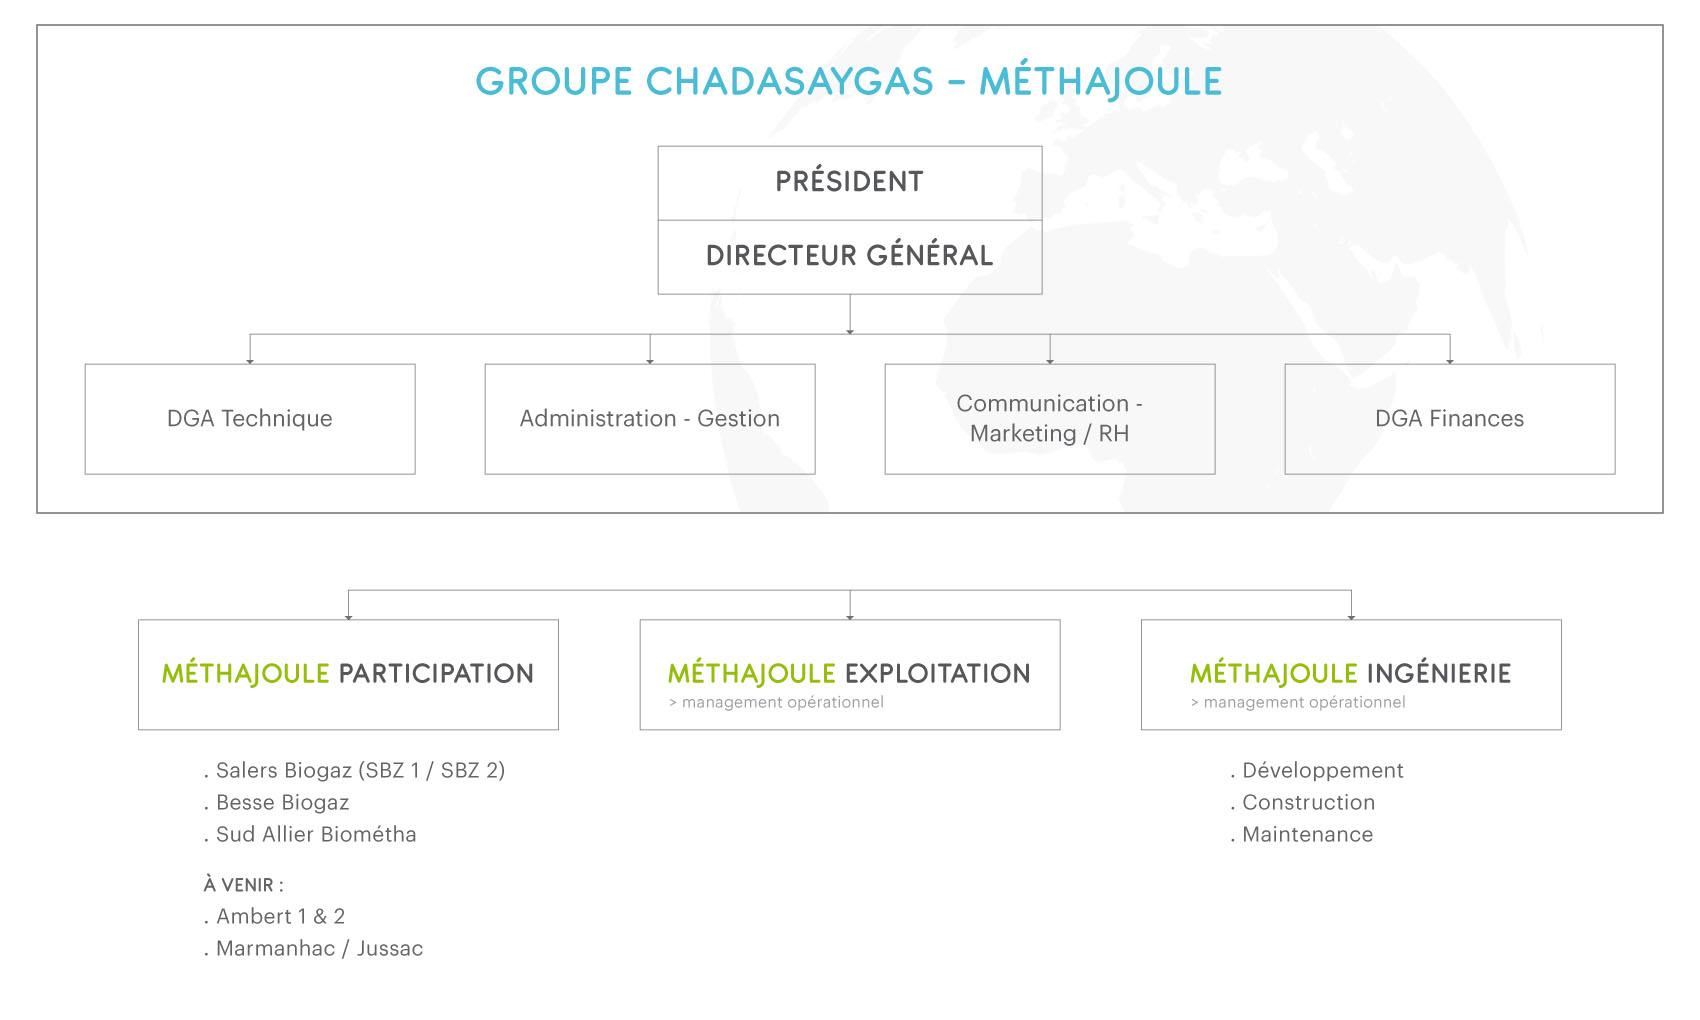 Groupe Chadasaygas - Méthajoule : Gouvernance